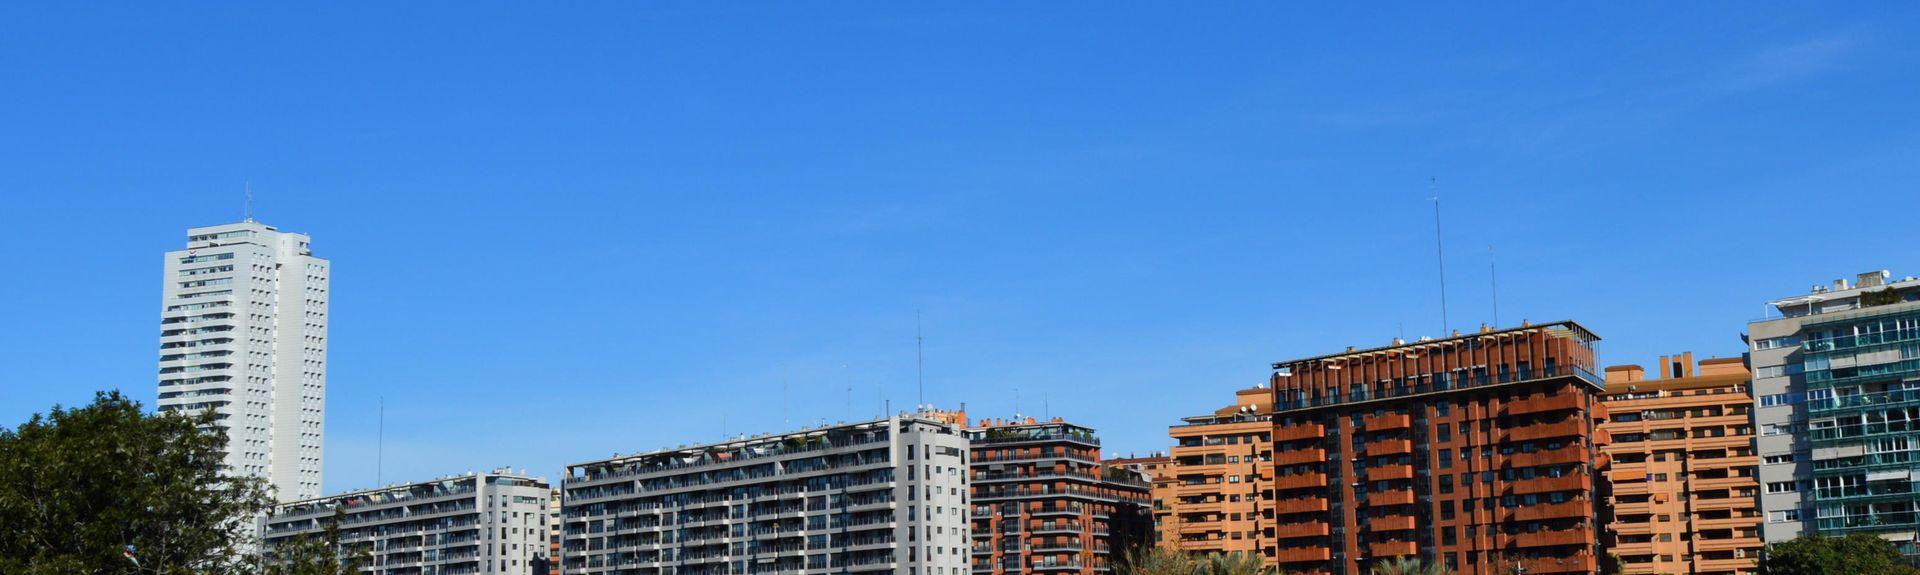 Penya-roja, València, Valencia, Spain